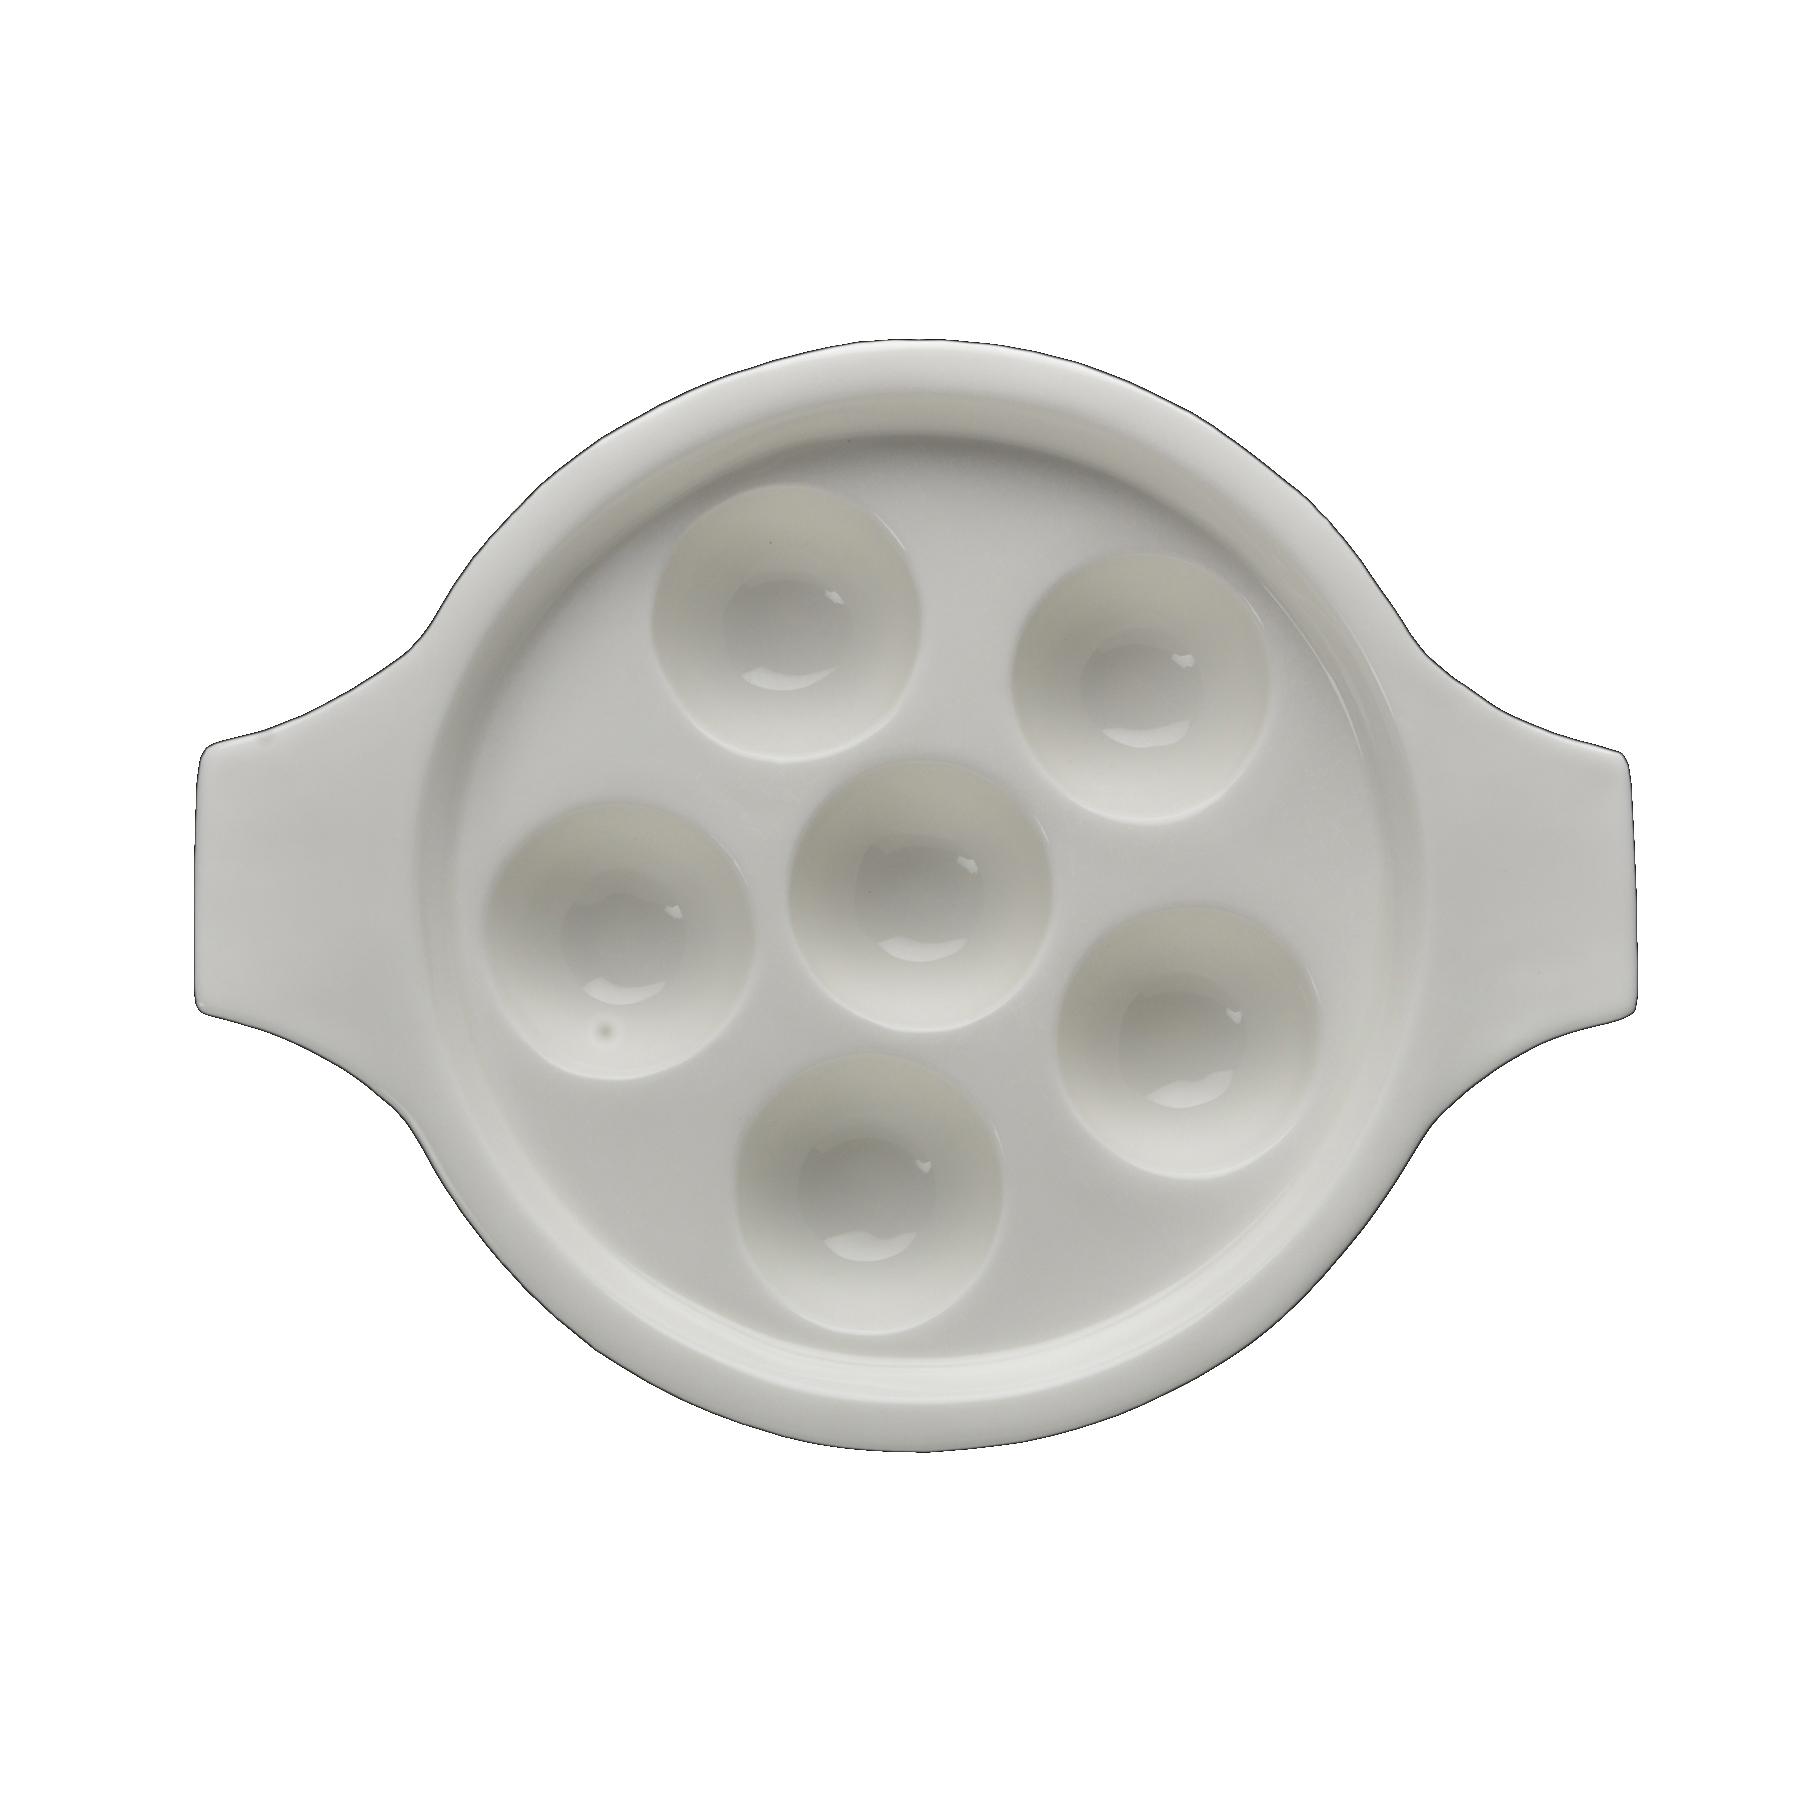 Fortessa Fortaluxe Basics White 8.25 Inch Escargot Dish with Handles